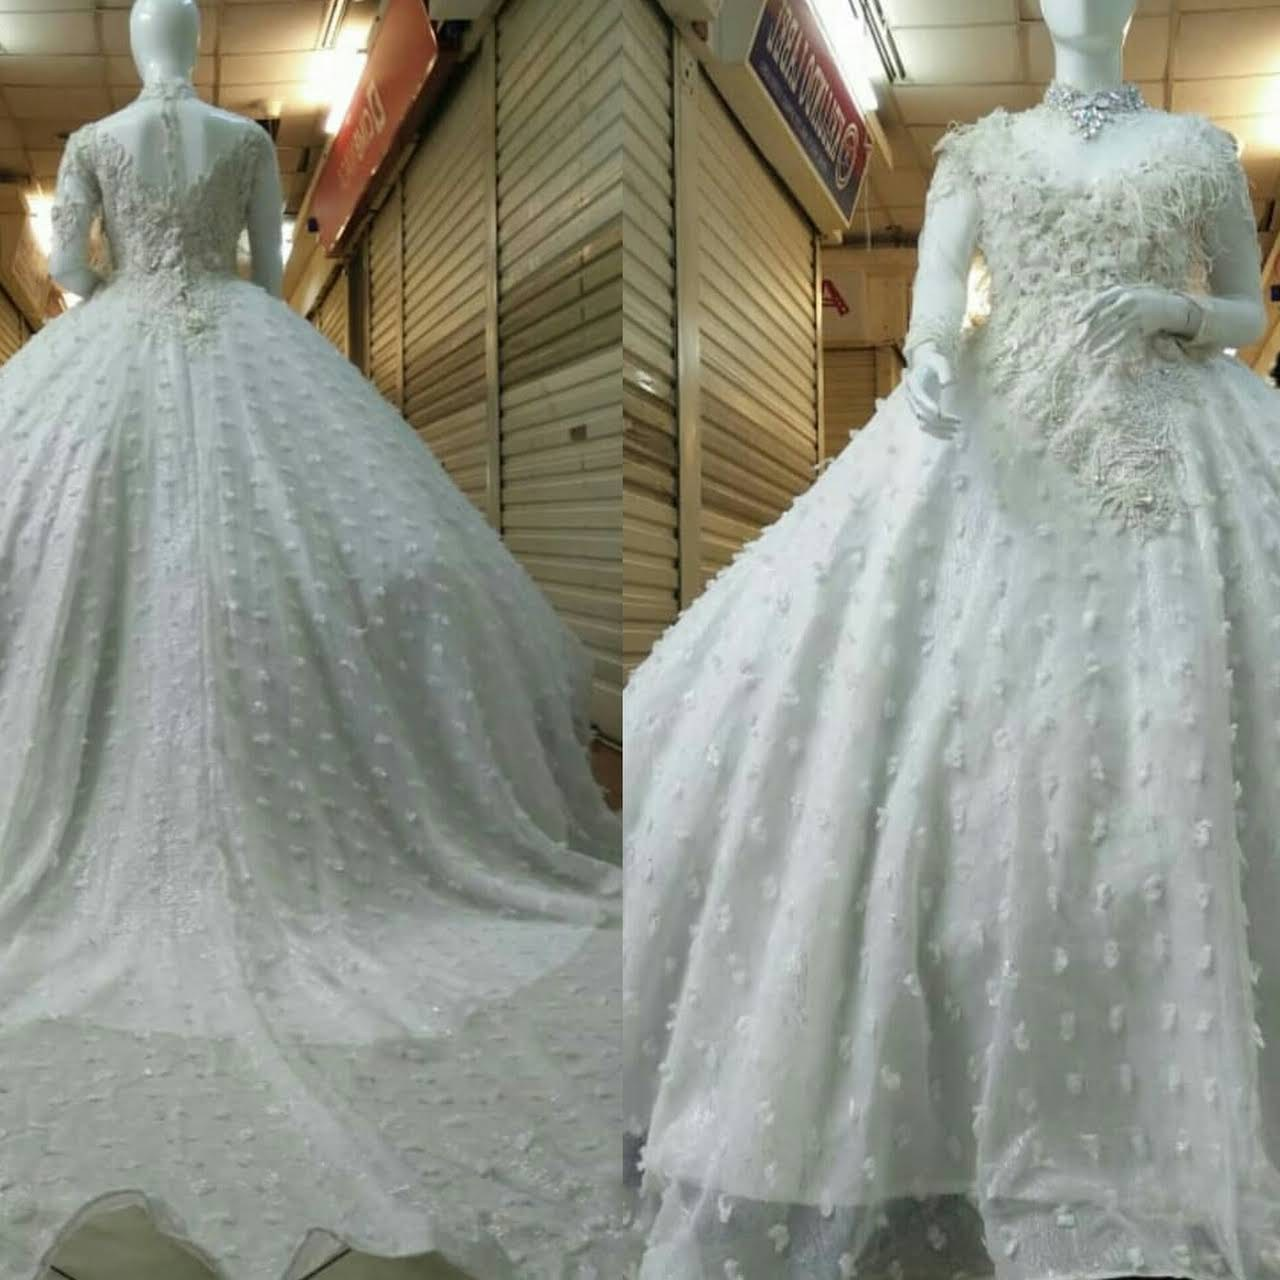 Model Sewa Baju Pengantin Muslimah Tangerang Thdr Gaun Kebaya Pengantin Muslimah Hijab Syari Layanan Belanja